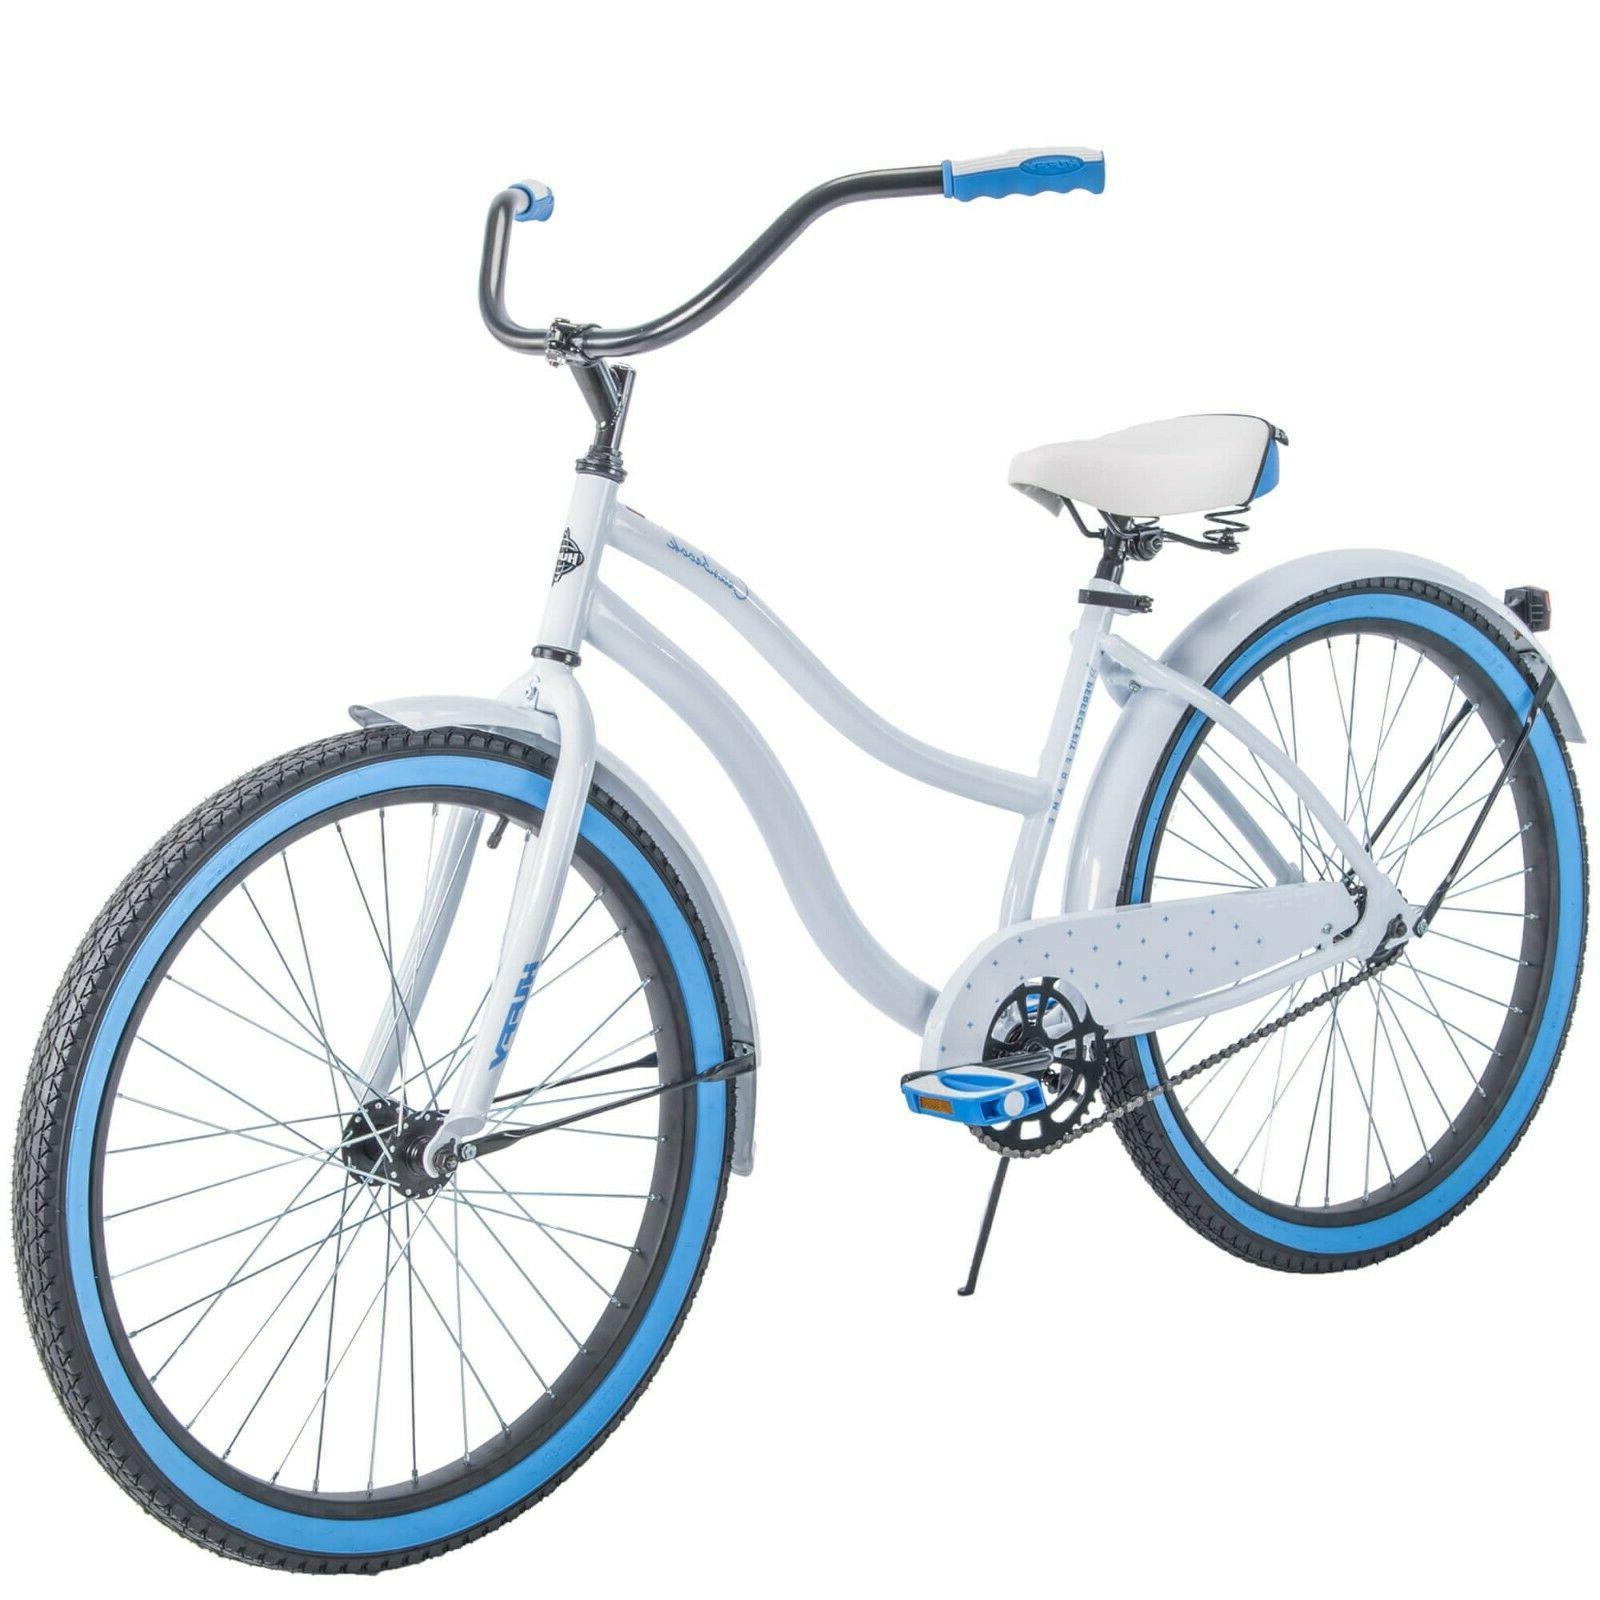 "Huffy 26"" White Cranbrook Women's Cruiser Bike with Perfect"